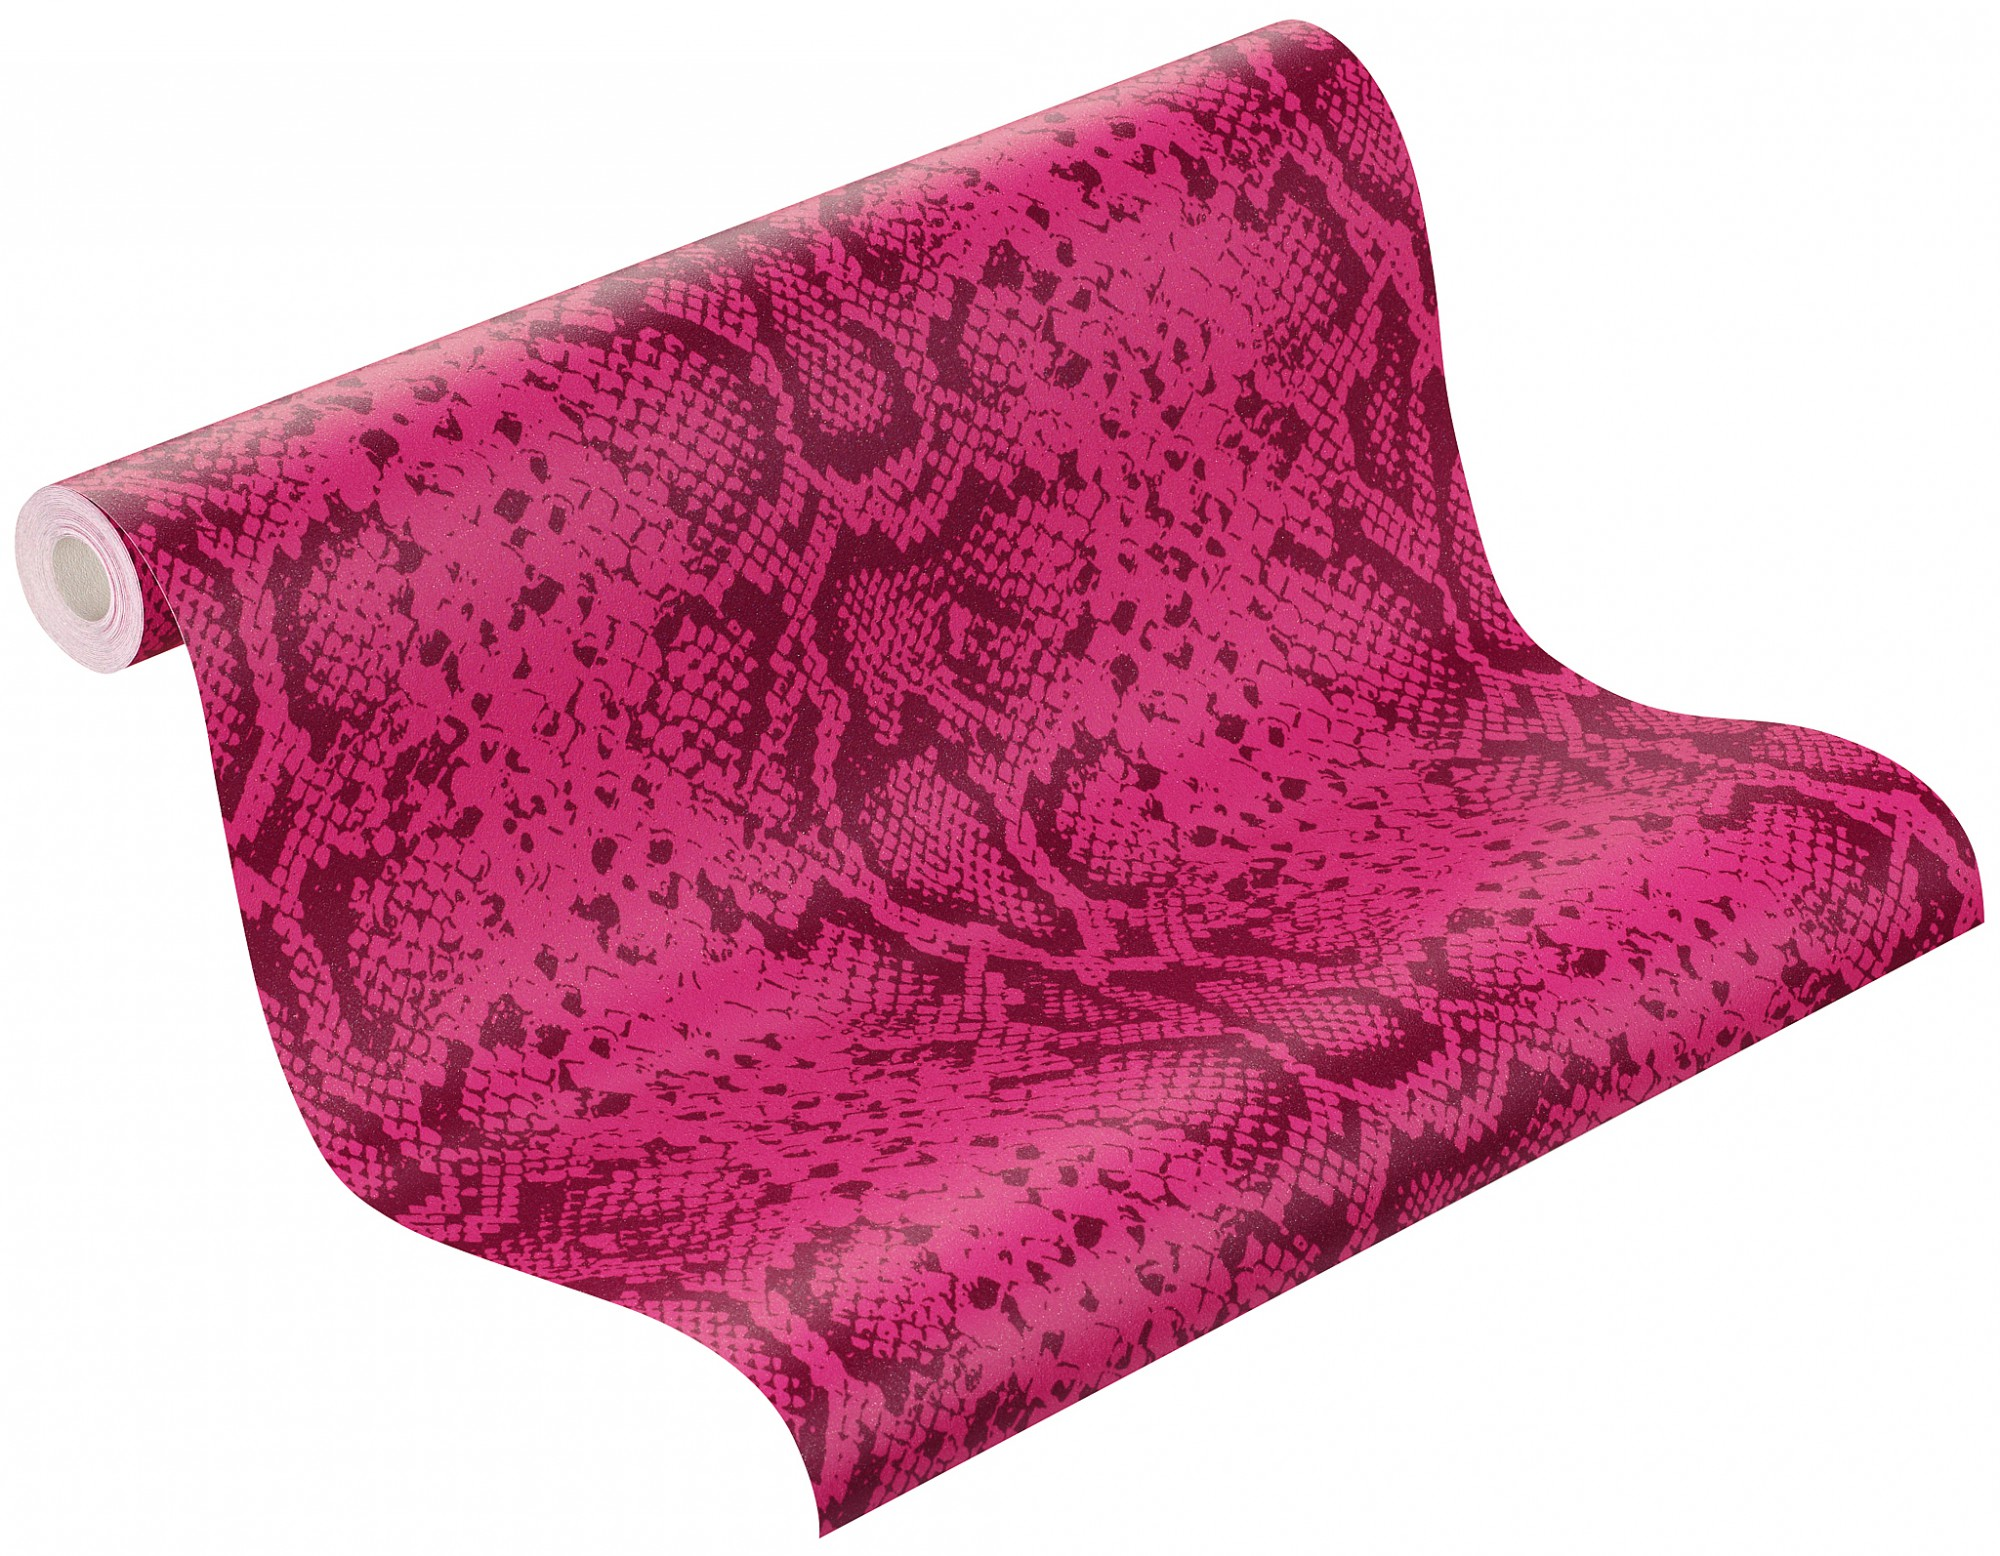 Glitzer Tapete Barbara Becker : Tapete Rasch Schlangenhaut-Optik Tapete 281002 pink lila glitzer